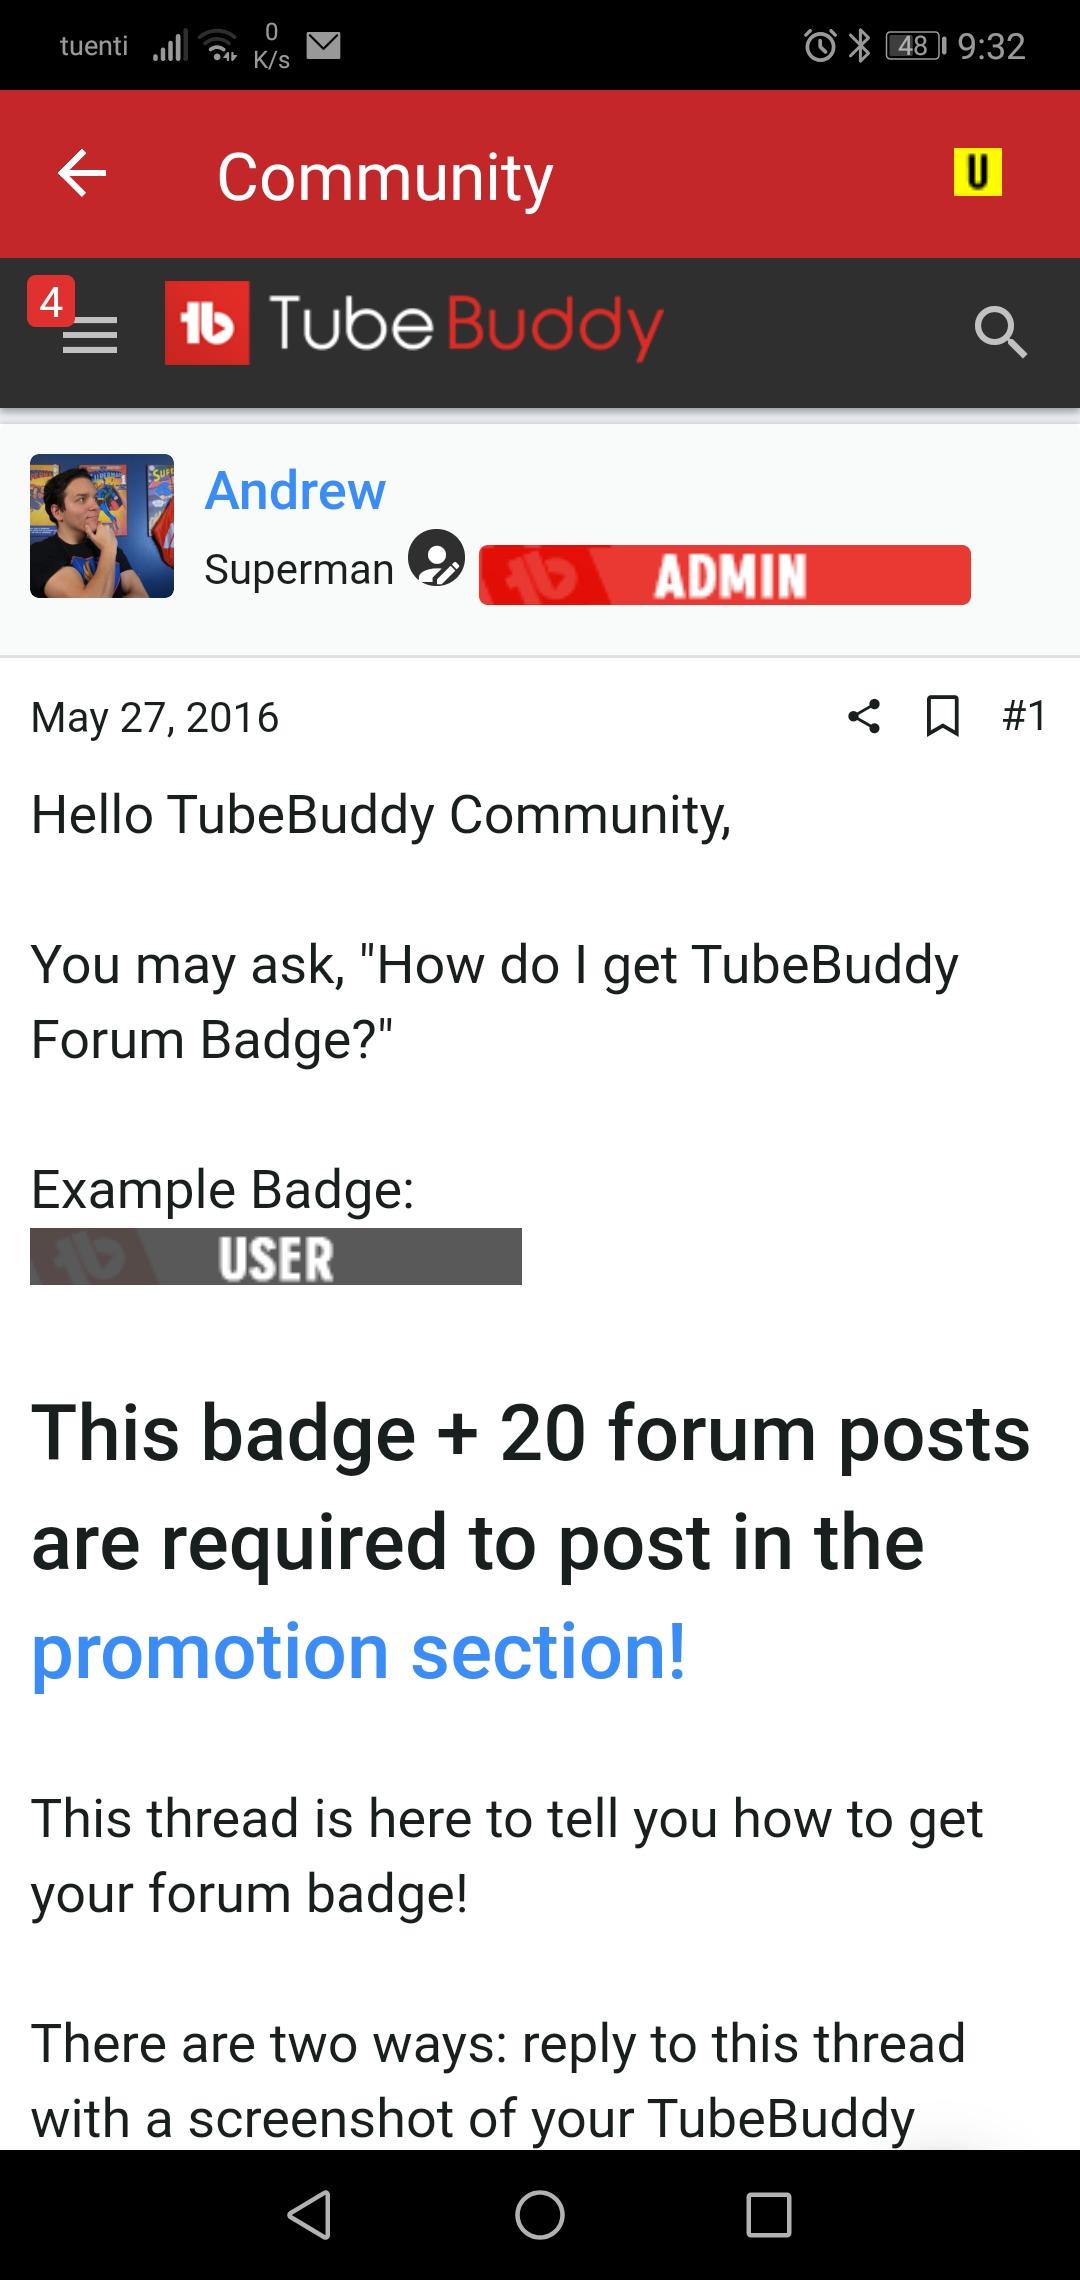 Screenshot_20200215_213232_com.tubebuddy.tubebuddy_mobile.jpg